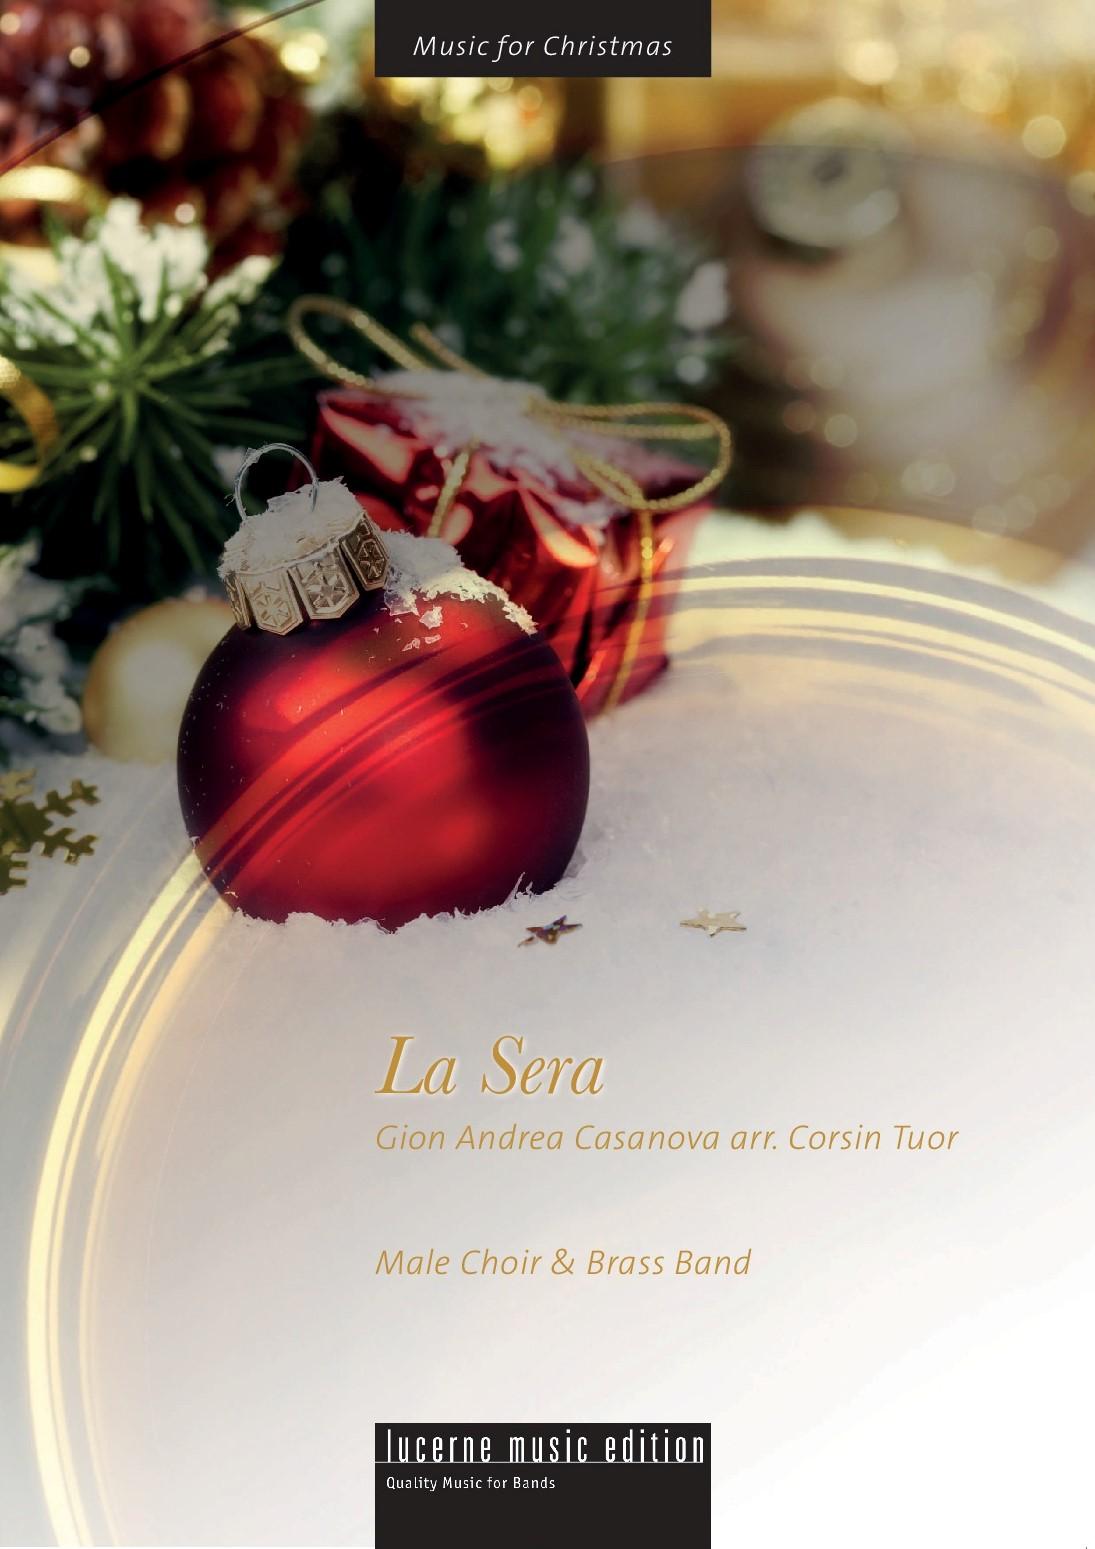 La sera (The Evening)